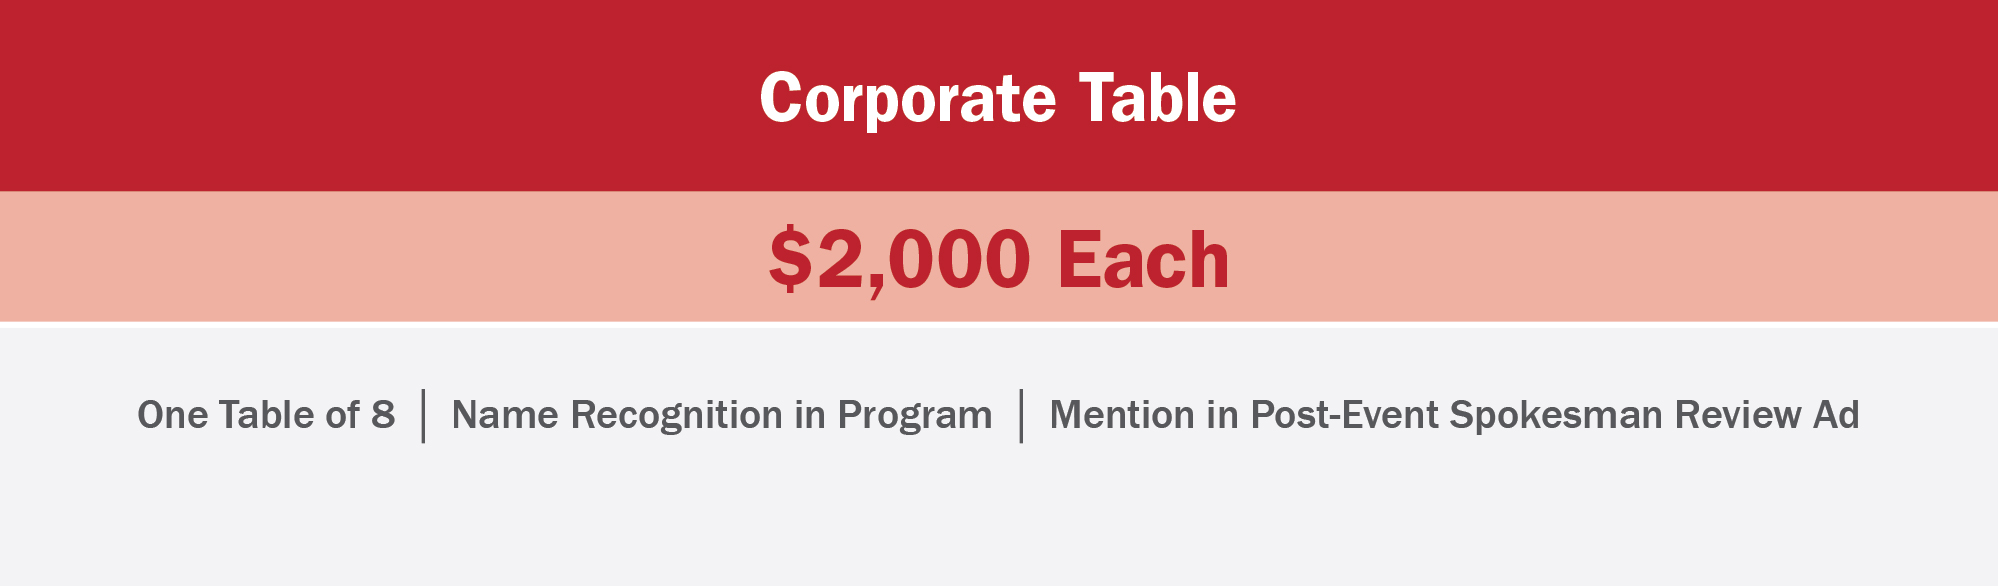 Corporate table sponsors